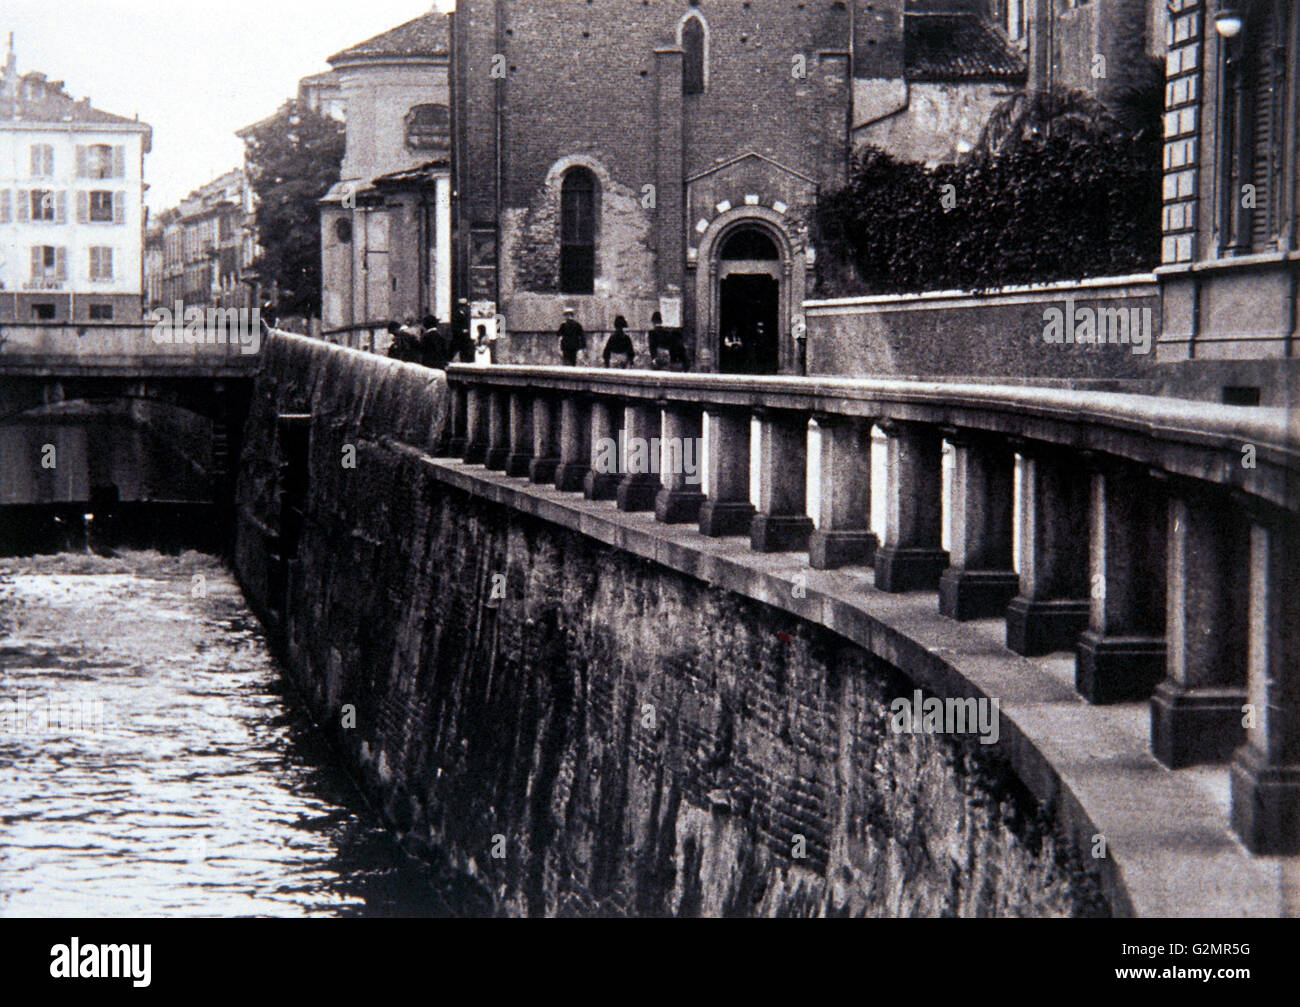 via Fatebenefratelli, Milano der 30er Jahre Stockbild